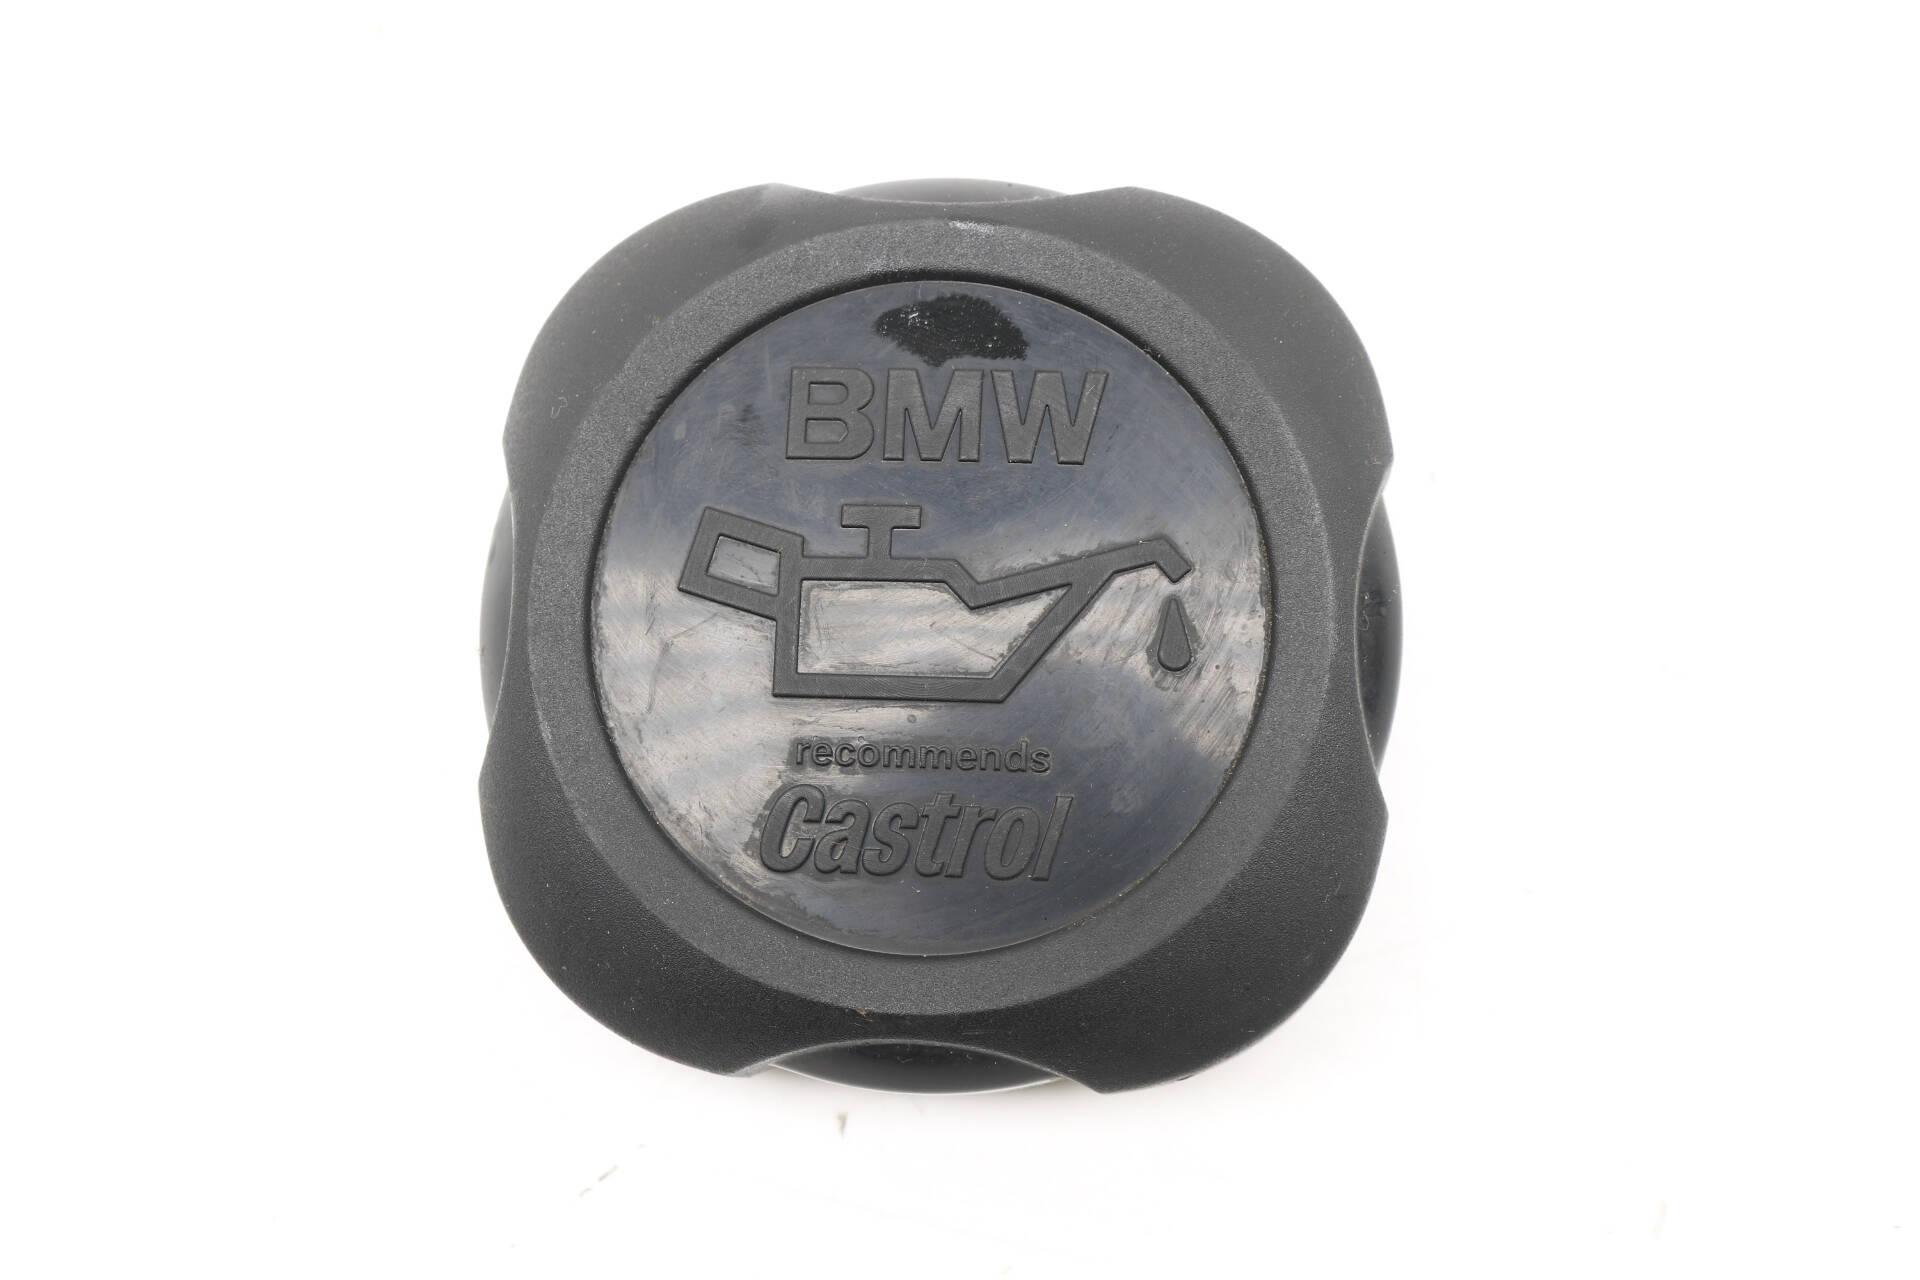 2007 2008 2009 2010 2011 2012 2013 Bmw X5 E70 Engine Oil Cap Ebay